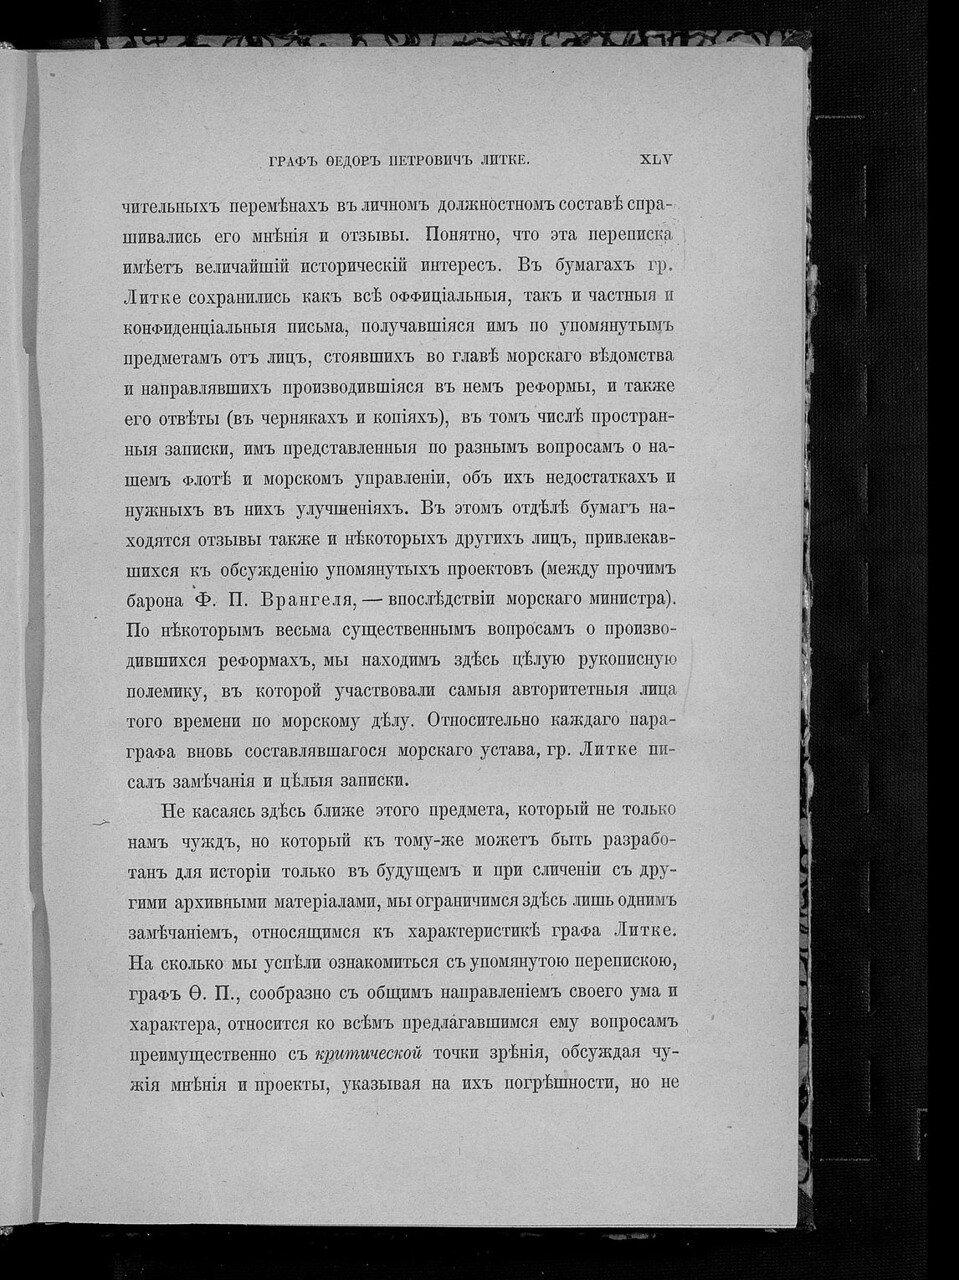 https://img-fotki.yandex.ru/get/742275/199368979.d2/0_21dd7f_454e25d5_XXXL.jpg